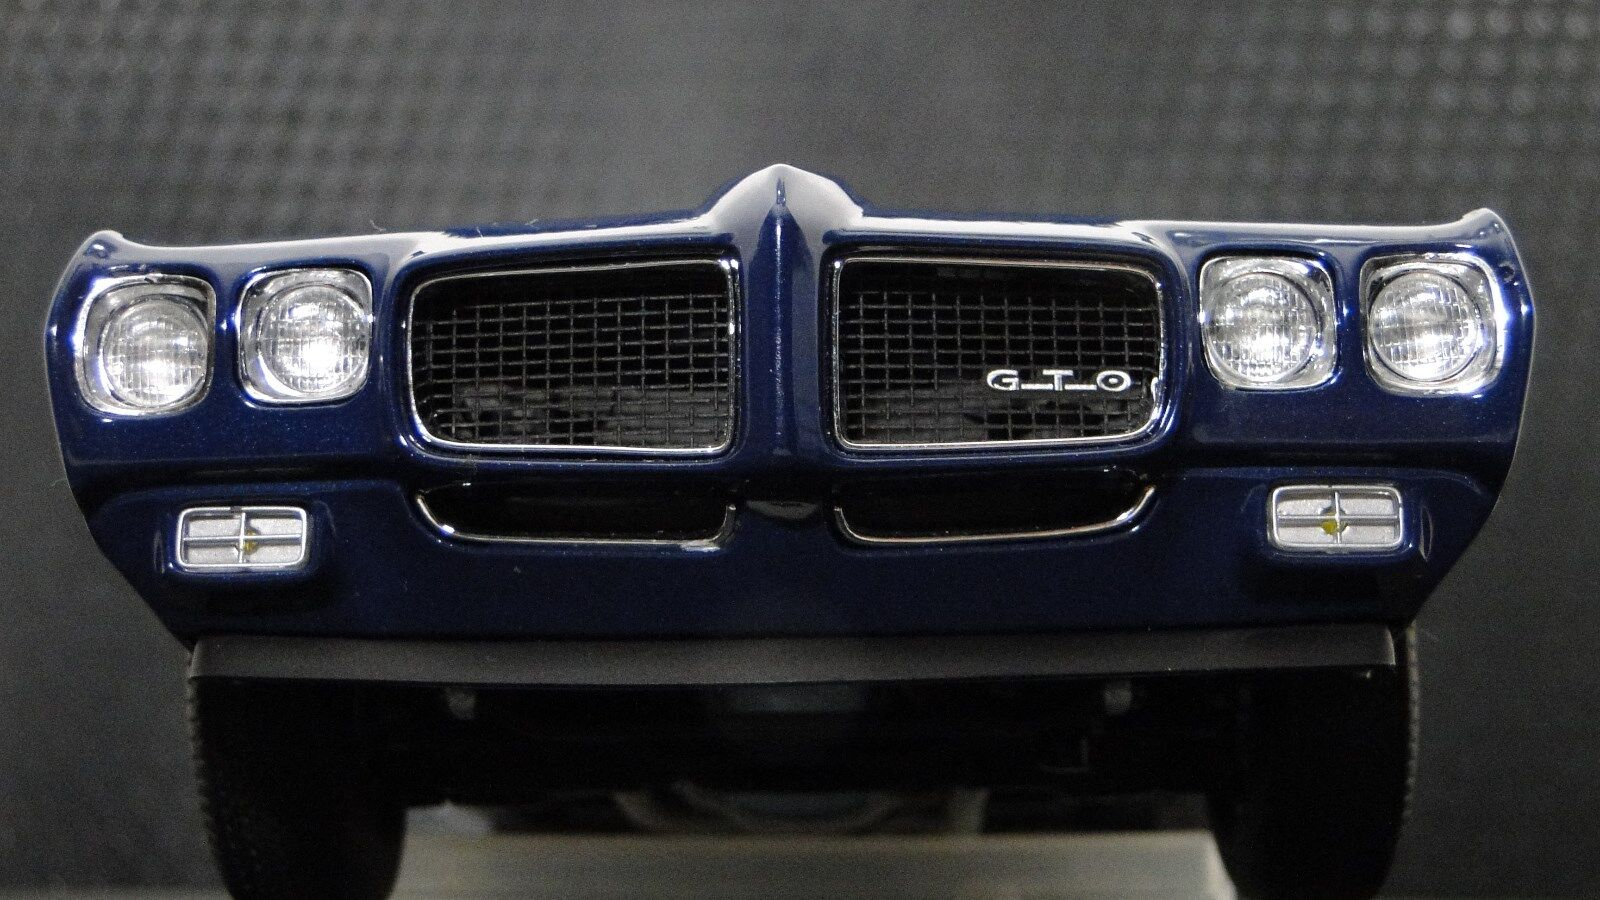 70er pontiac gto gebauten auto 1 18 hot rod 12 rennen 25 dragster vintage - modell 24 8.